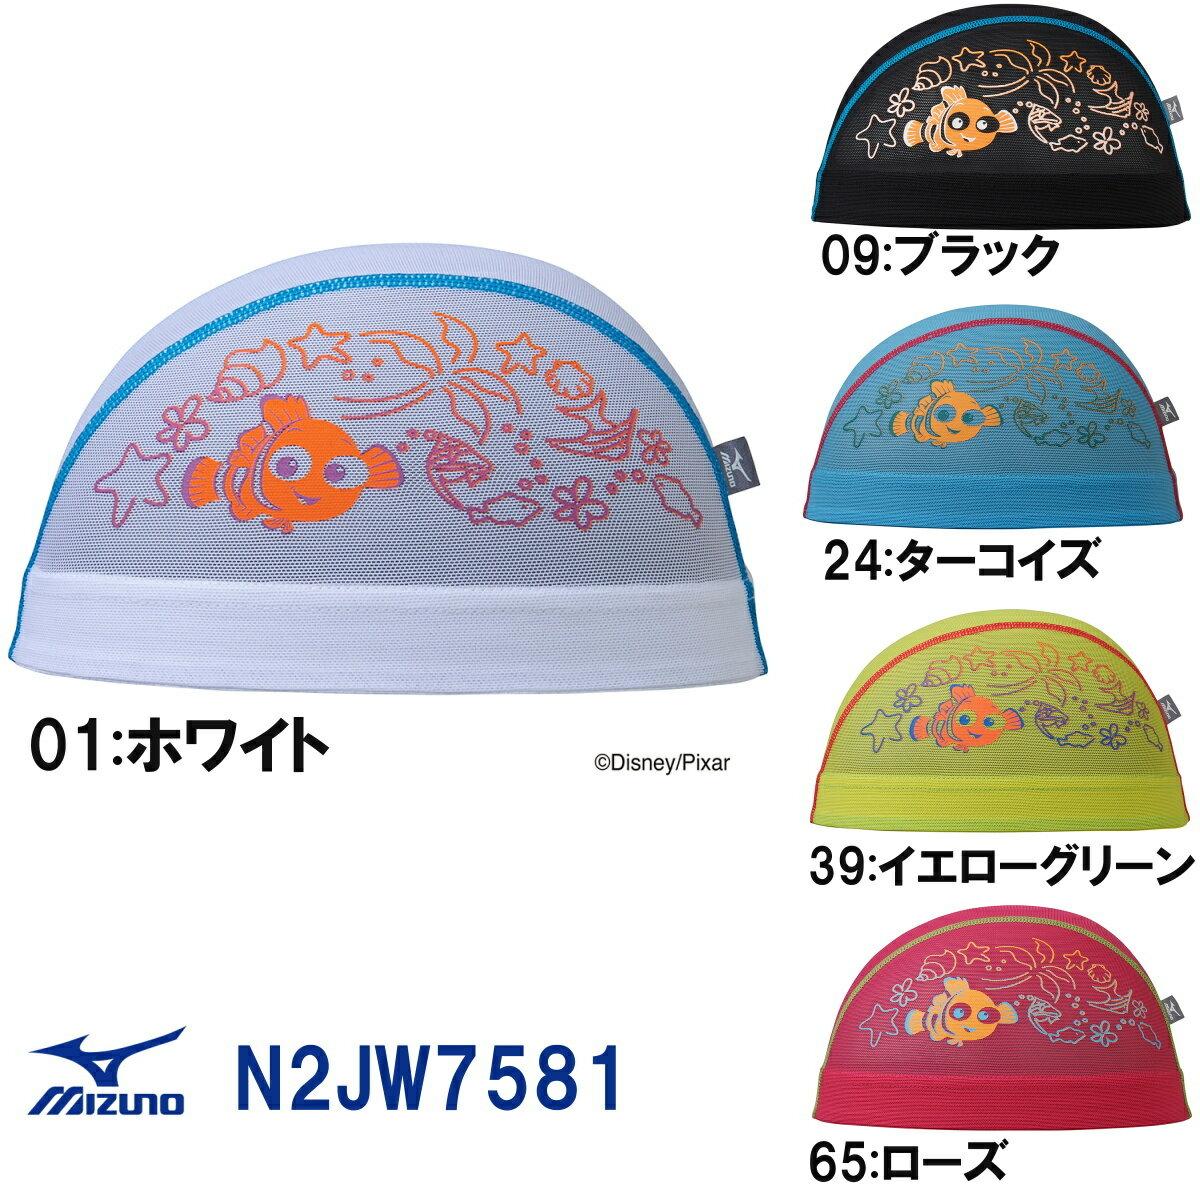 MIZUNO ミズノ メッシュキャップ DISNEY Finding Nemo 2017年AW展示会受注生産モデル N2JW7581-HK